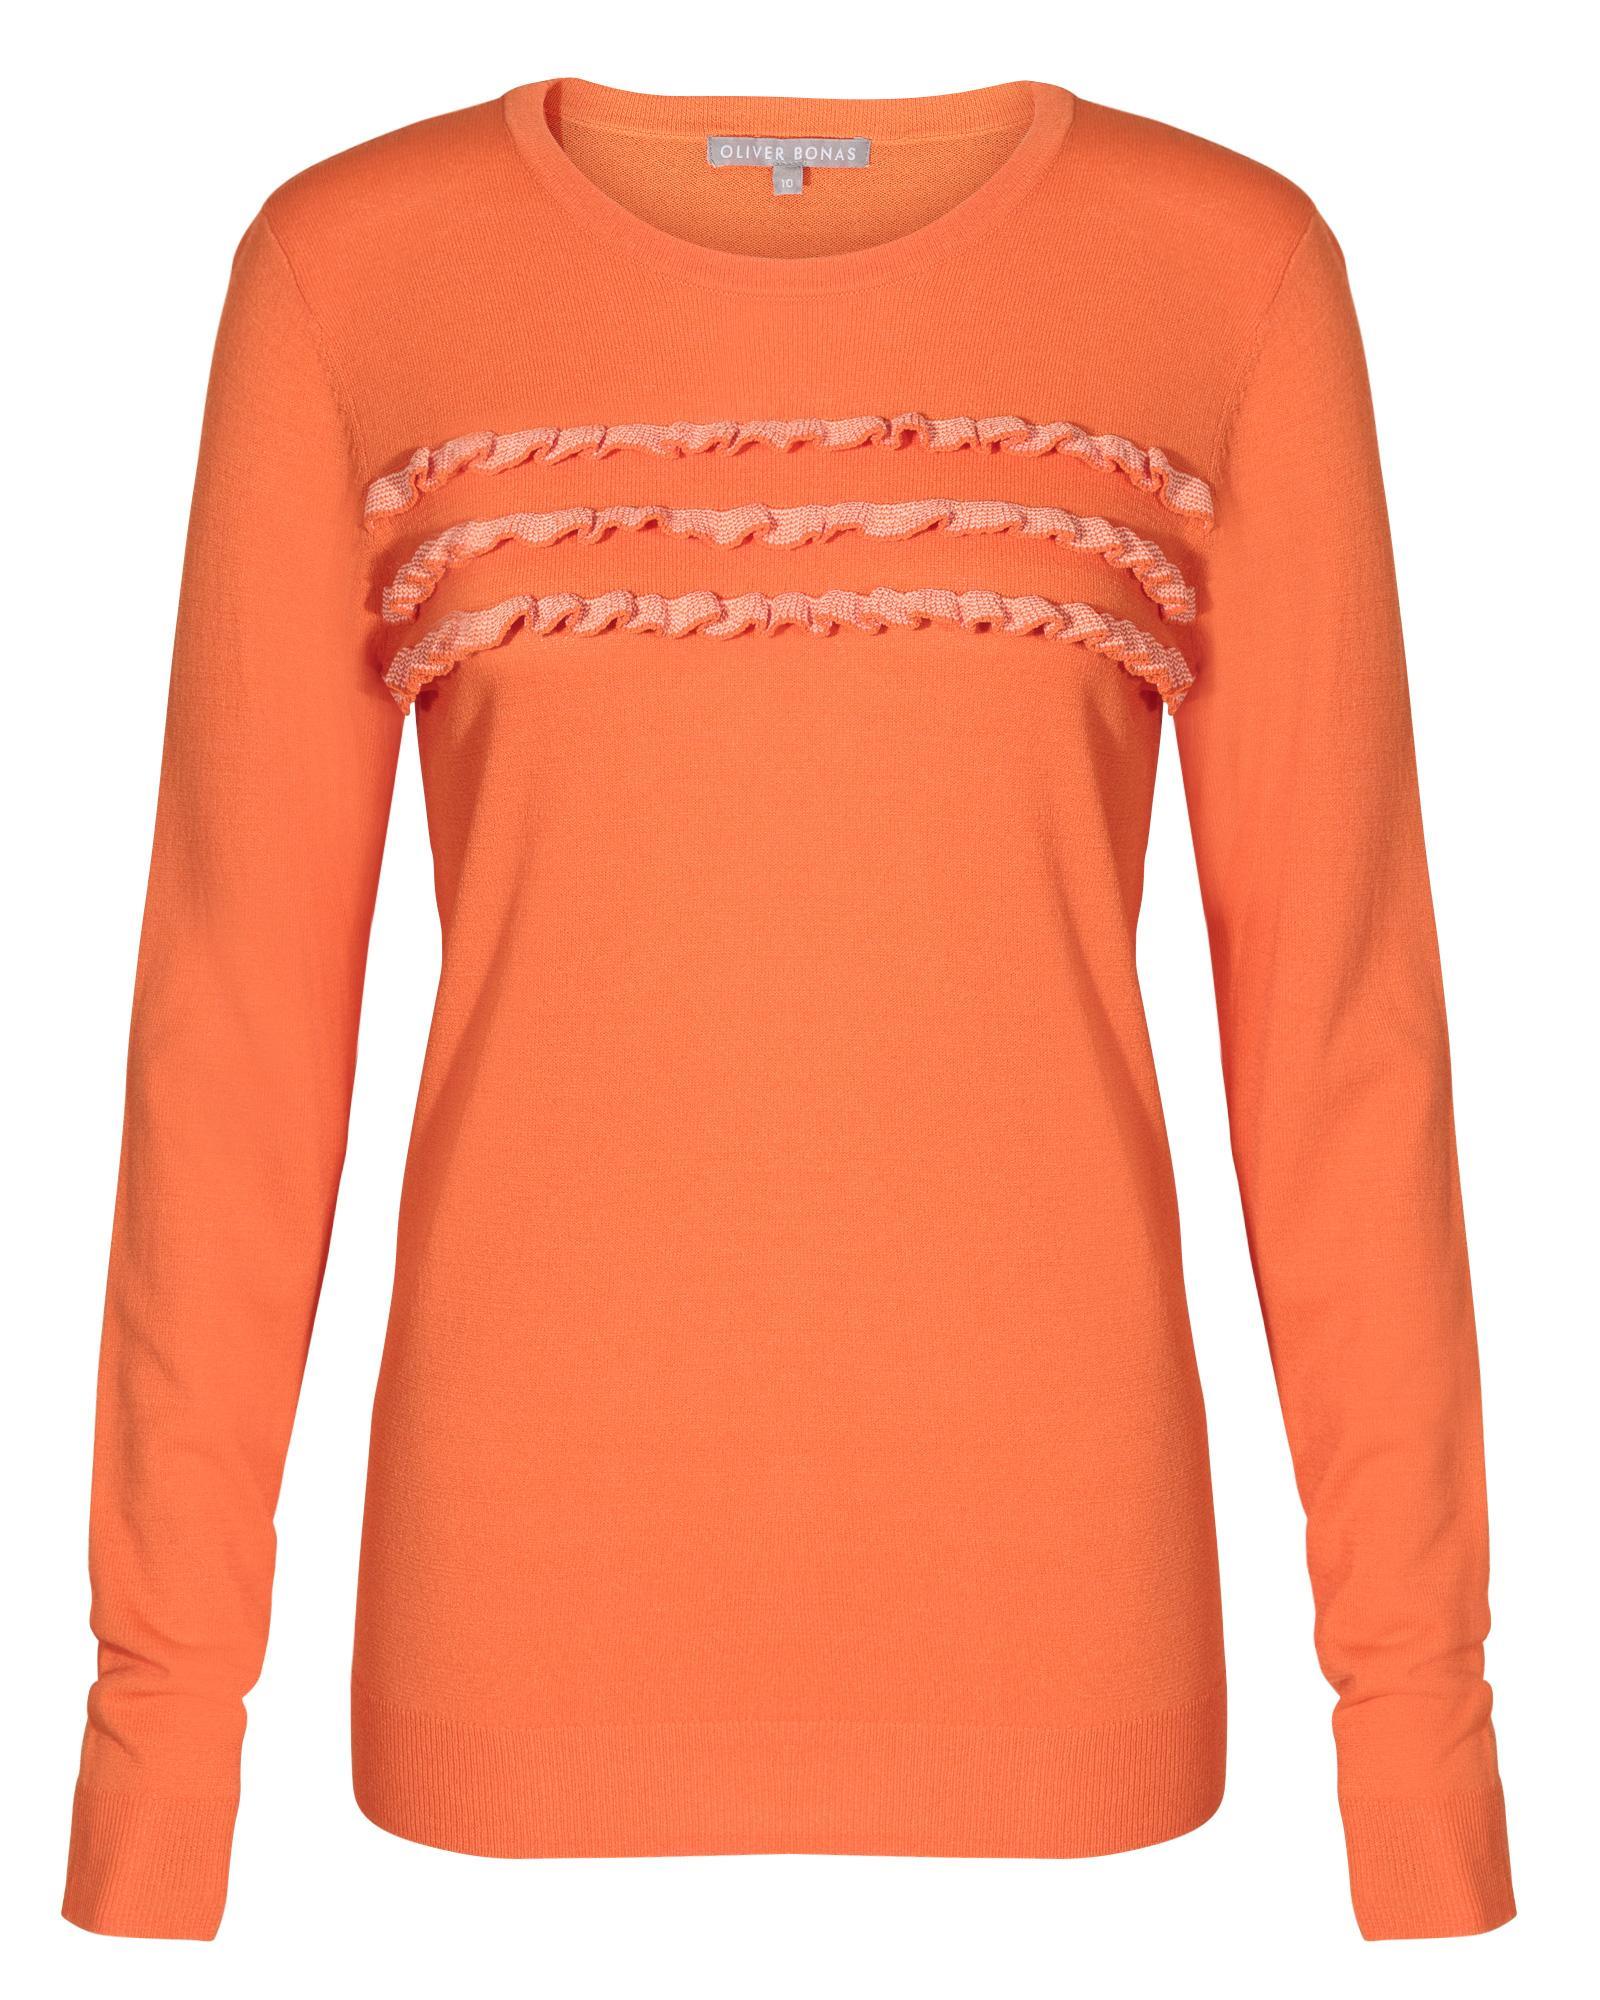 7580c334ce Oliver Bonas - Adore Ruffle Orange Sweater - Lyst. View fullscreen